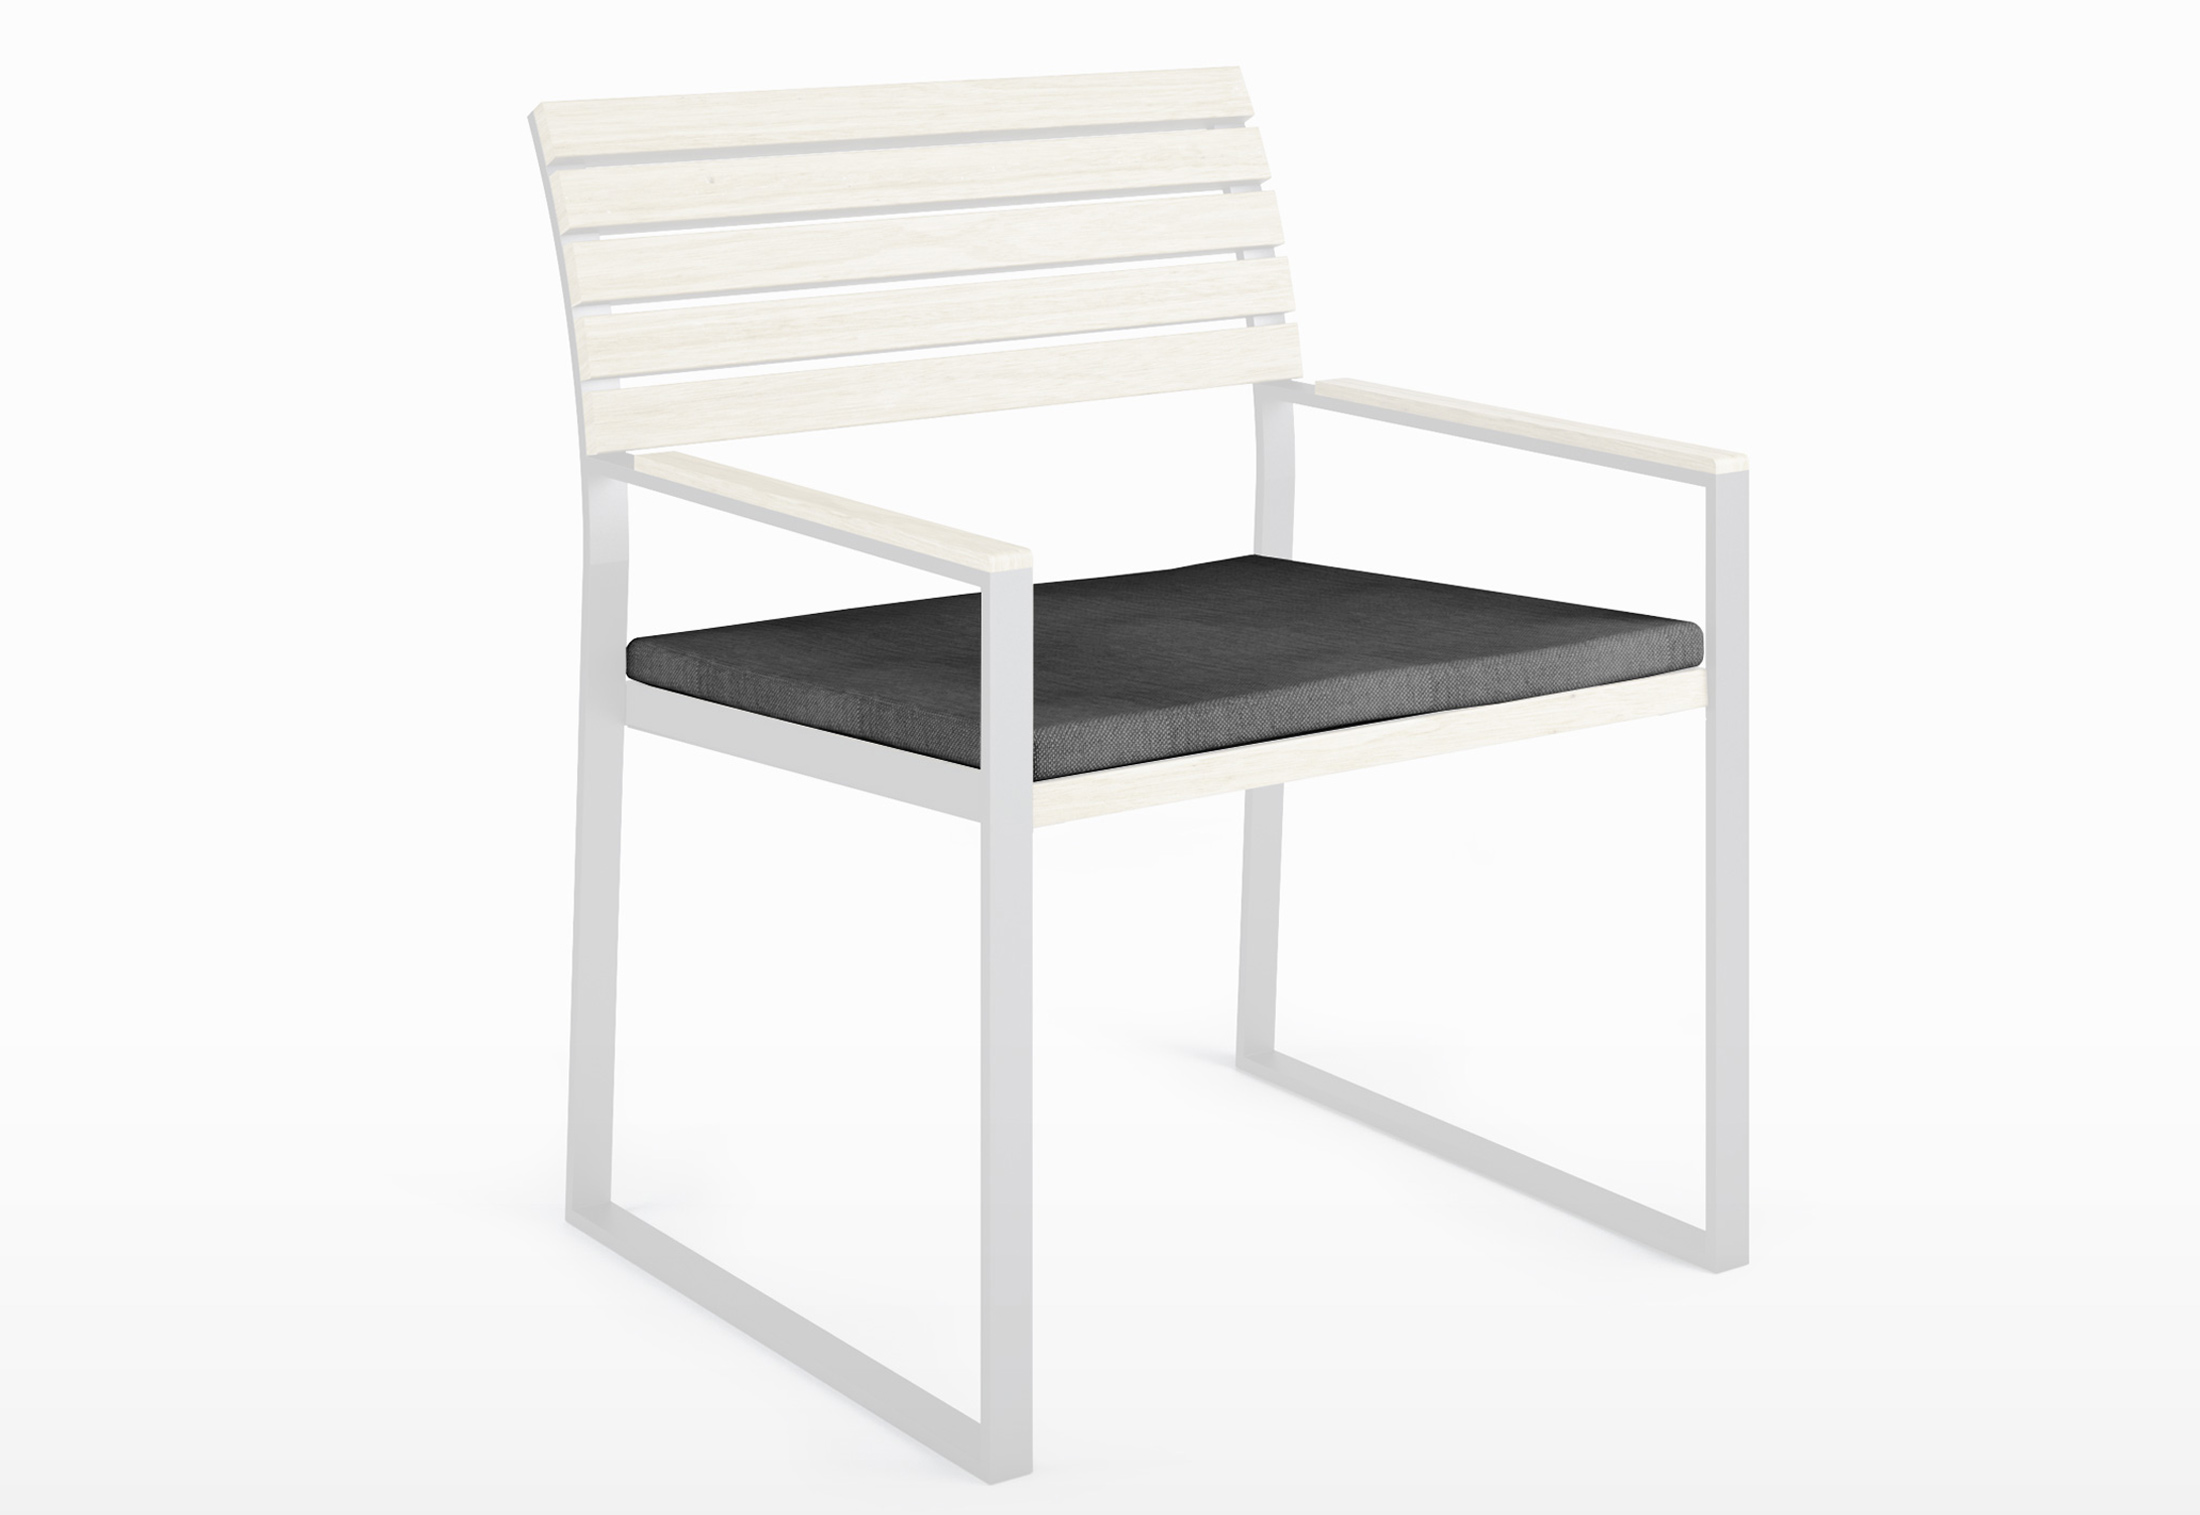 Garden Lounge Chair Cushion von Röshults